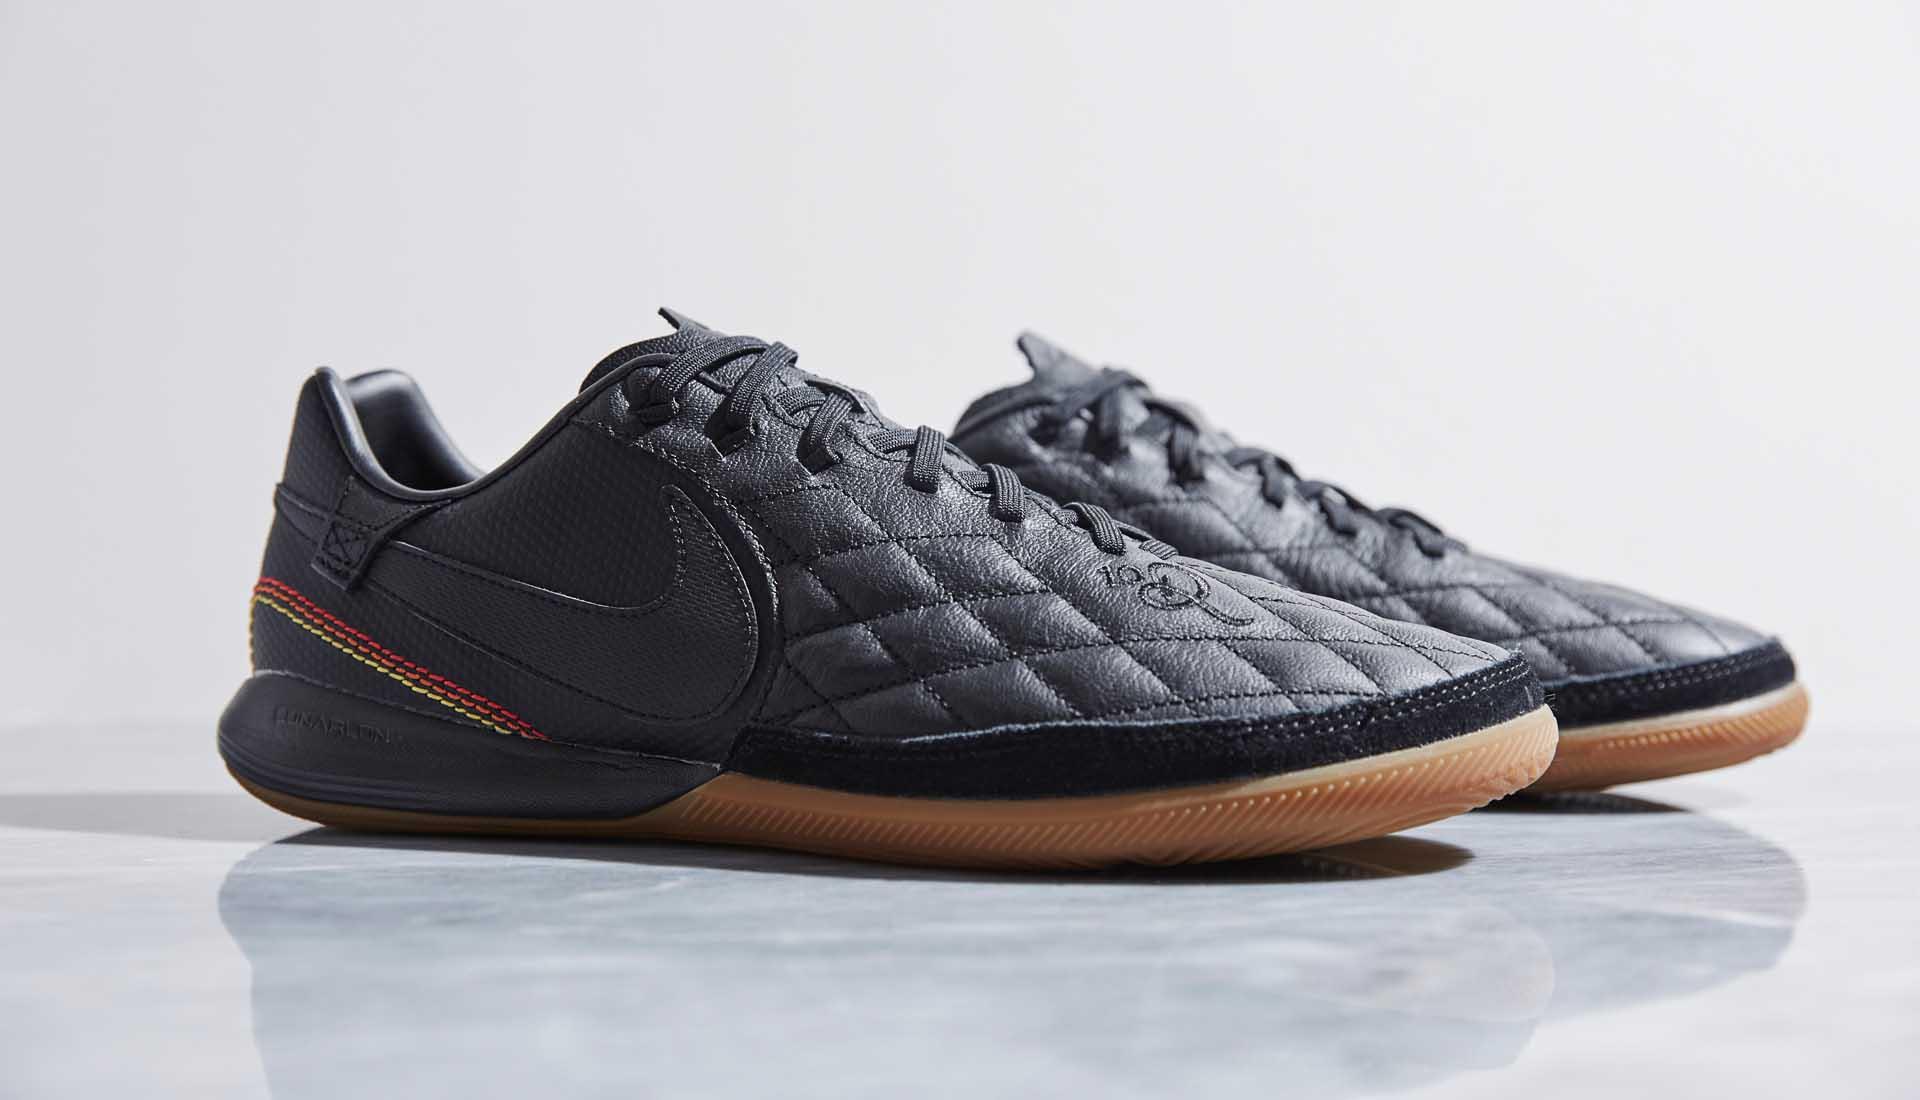 cheap for discount 12575 69c89 Nike Launch The TiempoX Finale Ronaldinho10 - SoccerBible